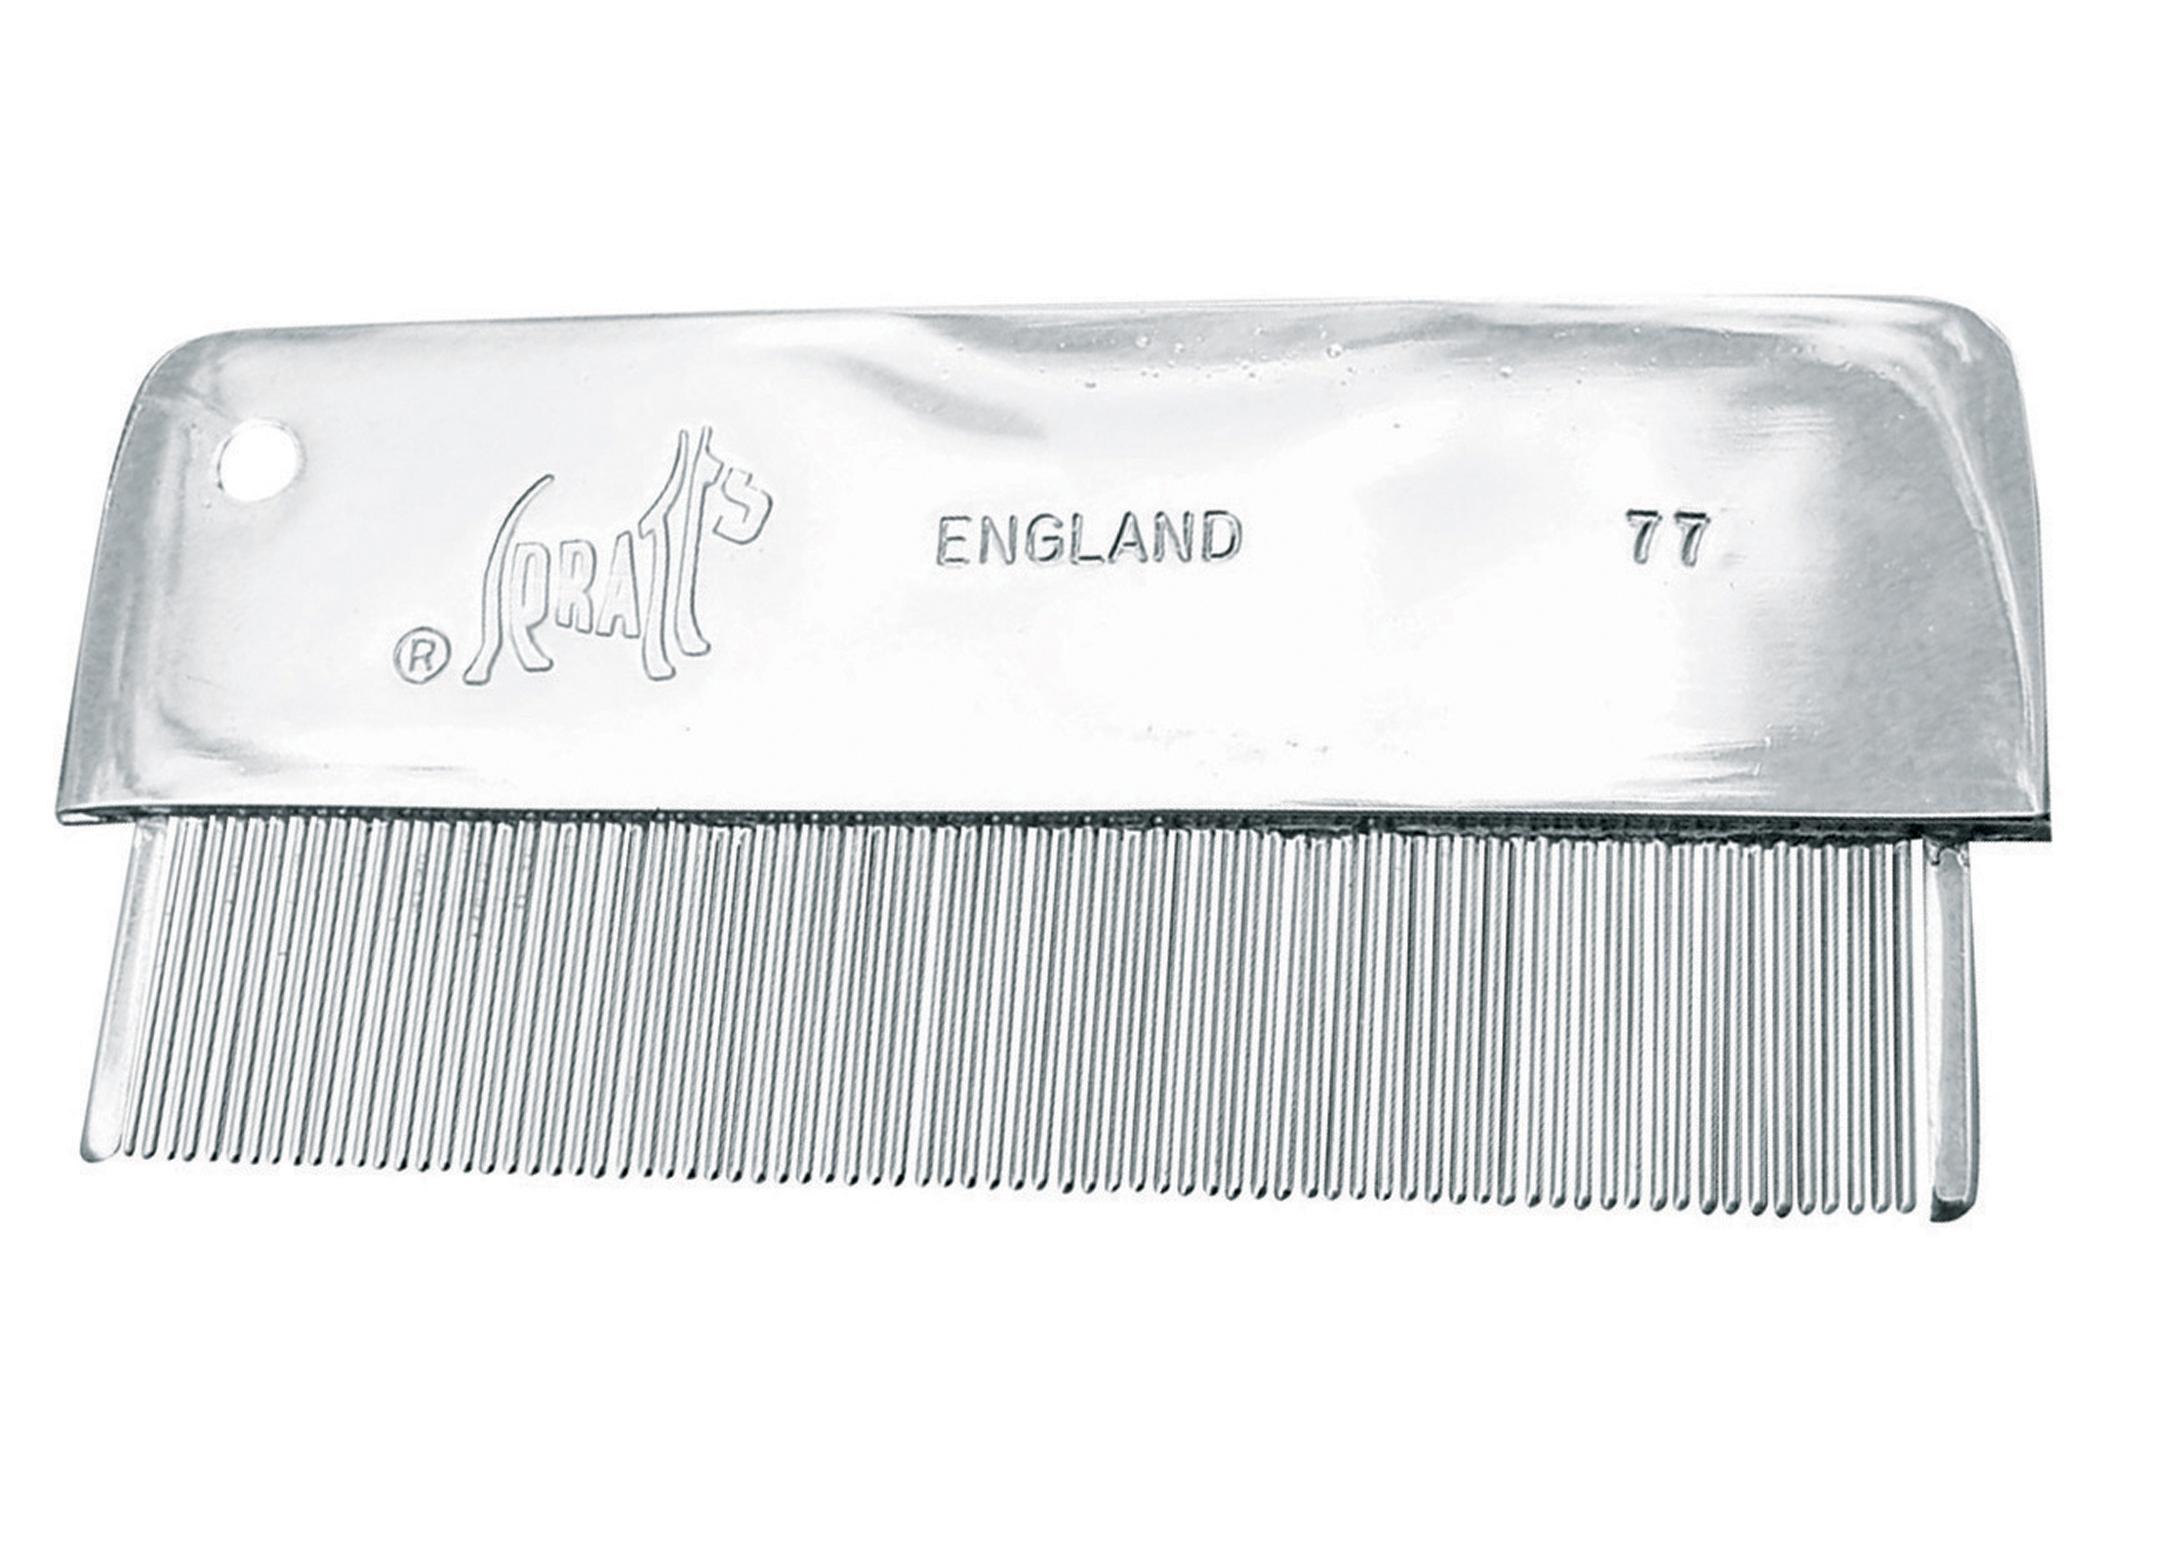 Spratts #77 Extra Fine Comb